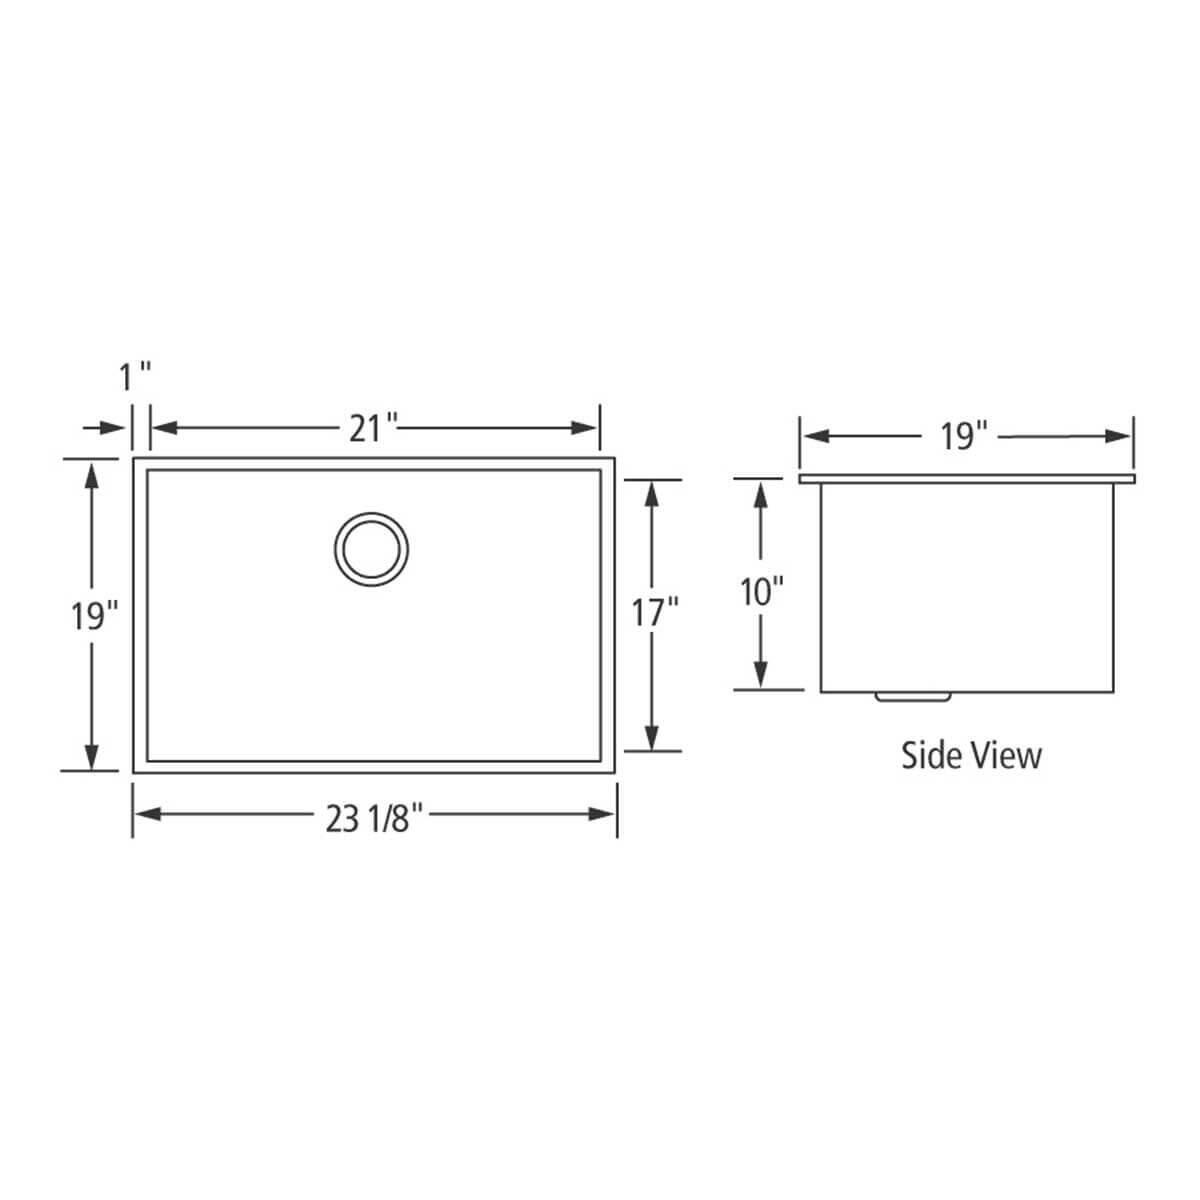 Artisan CPUZ2319-D10 Chef Pro Sink Dimensions